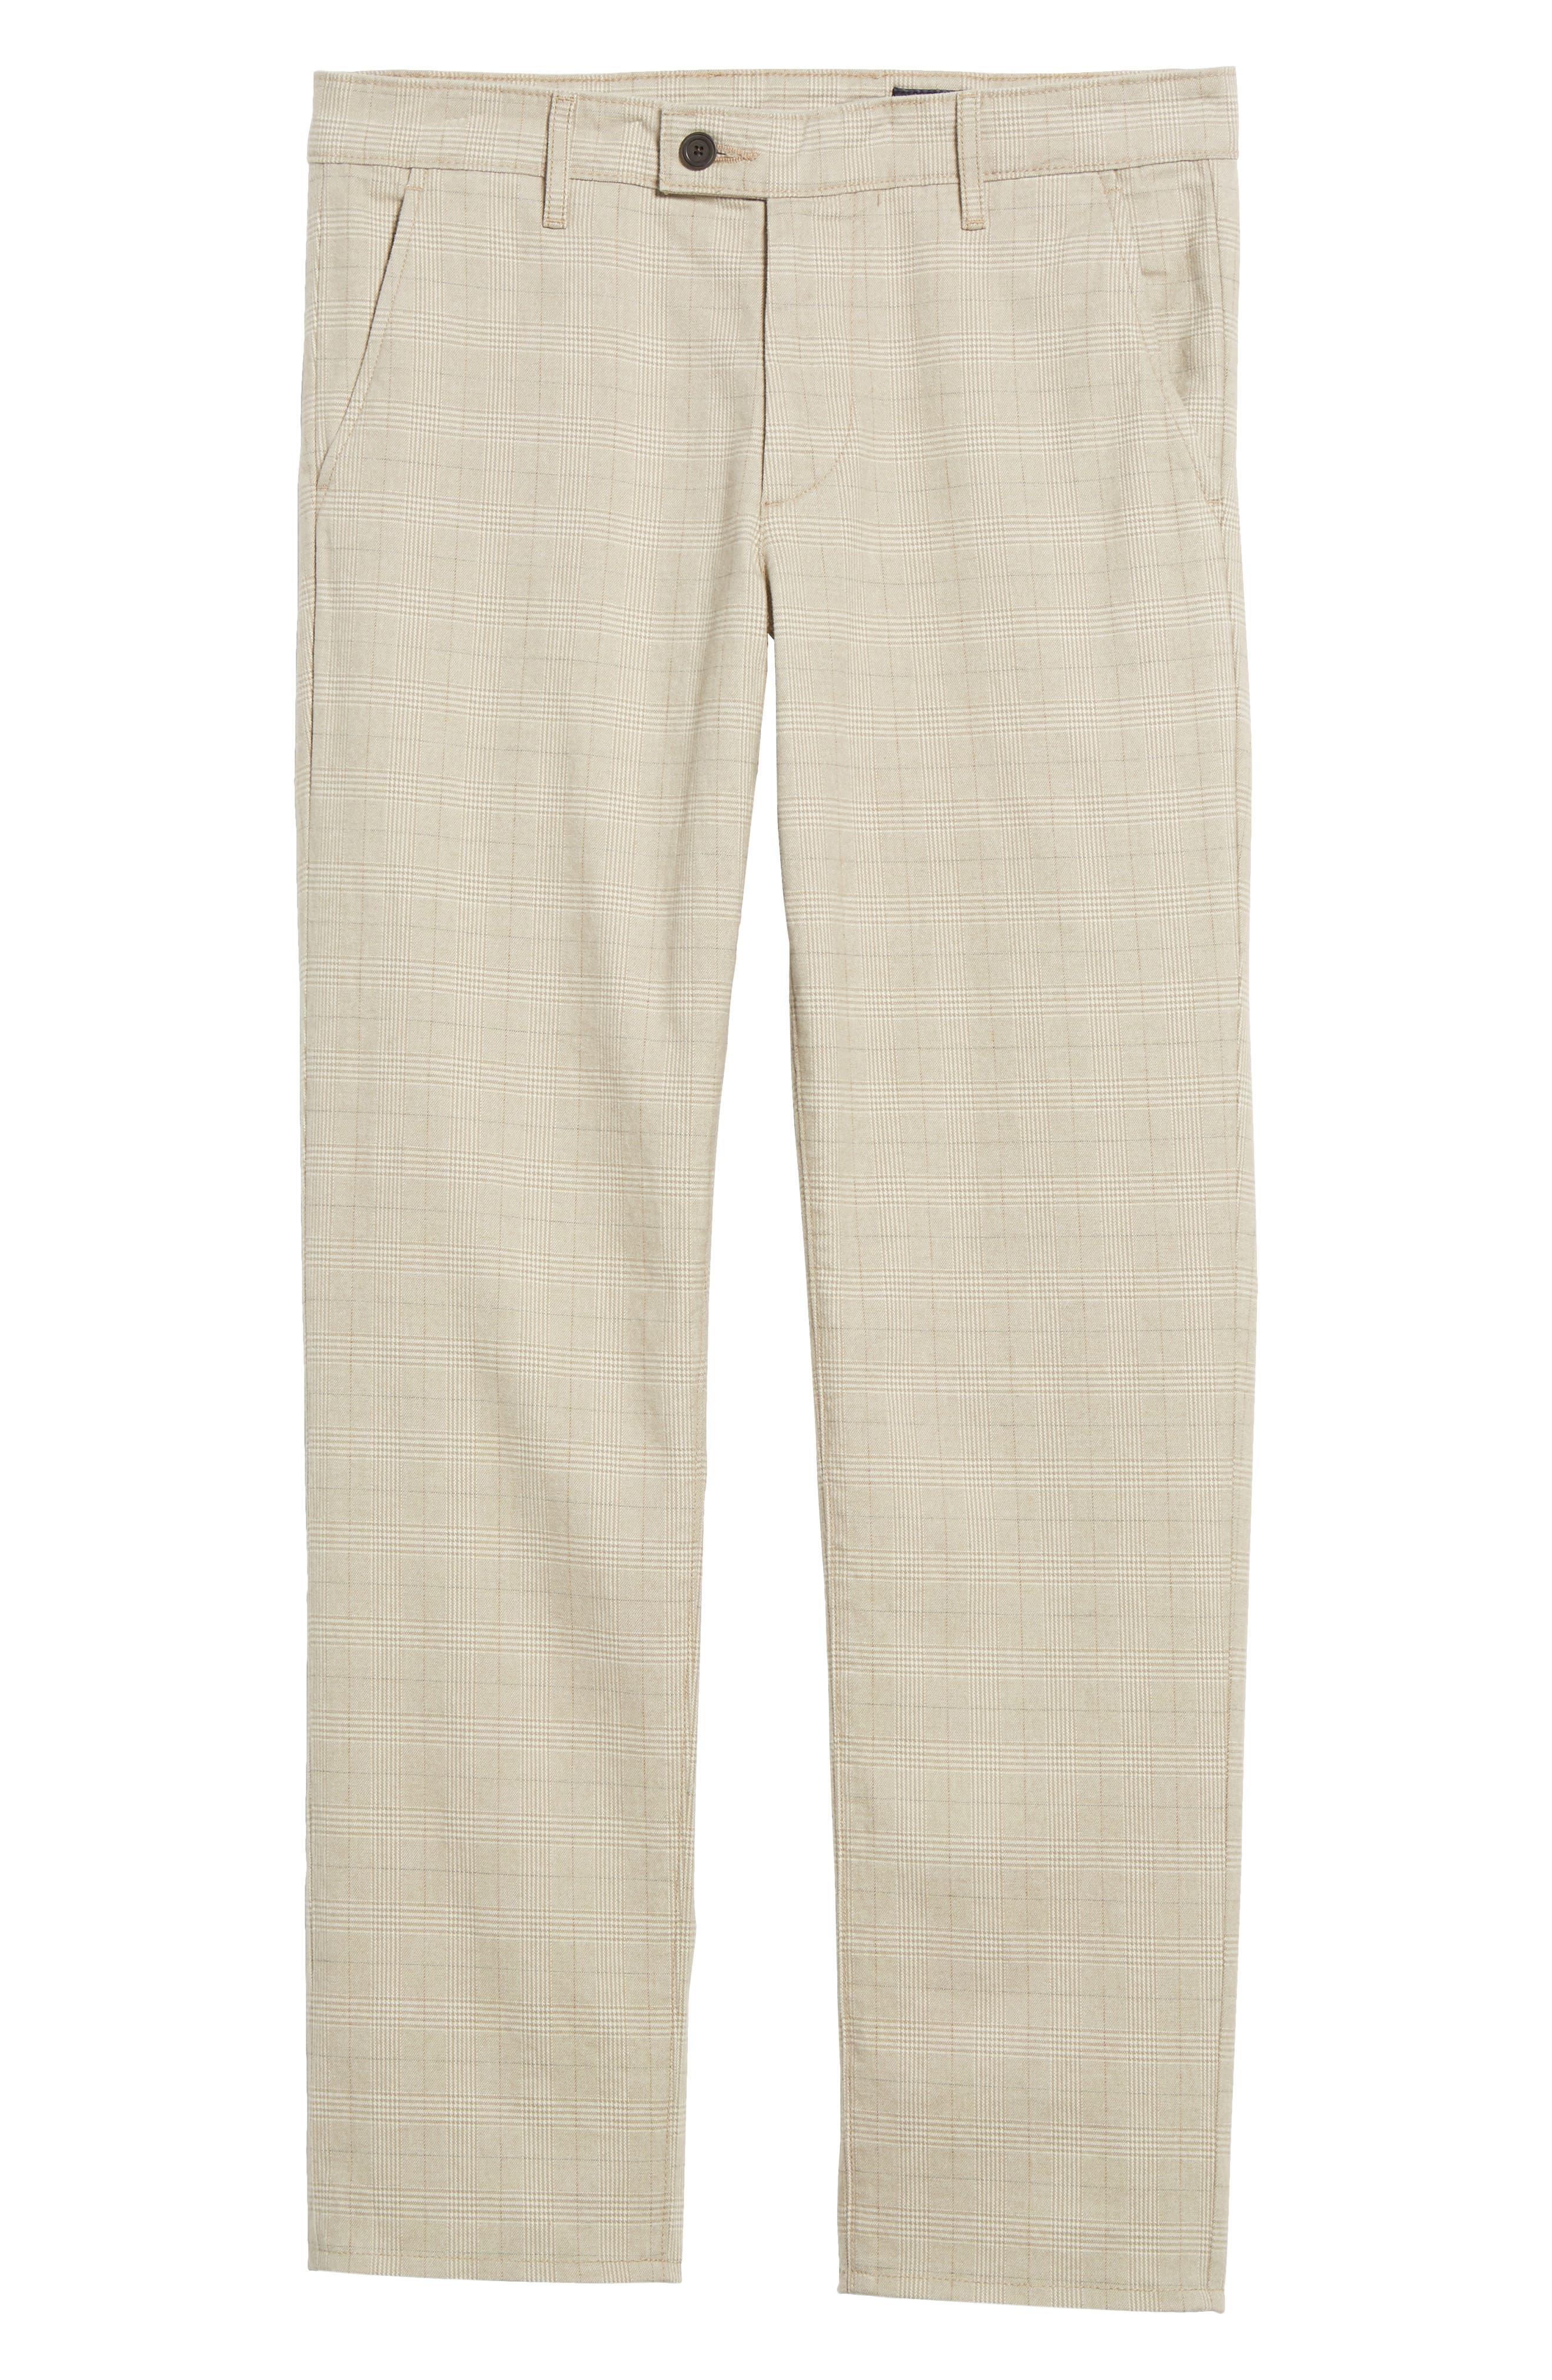 Marshall Slim Fit Pants,                             Alternate thumbnail 7, color,                             Silica Sand